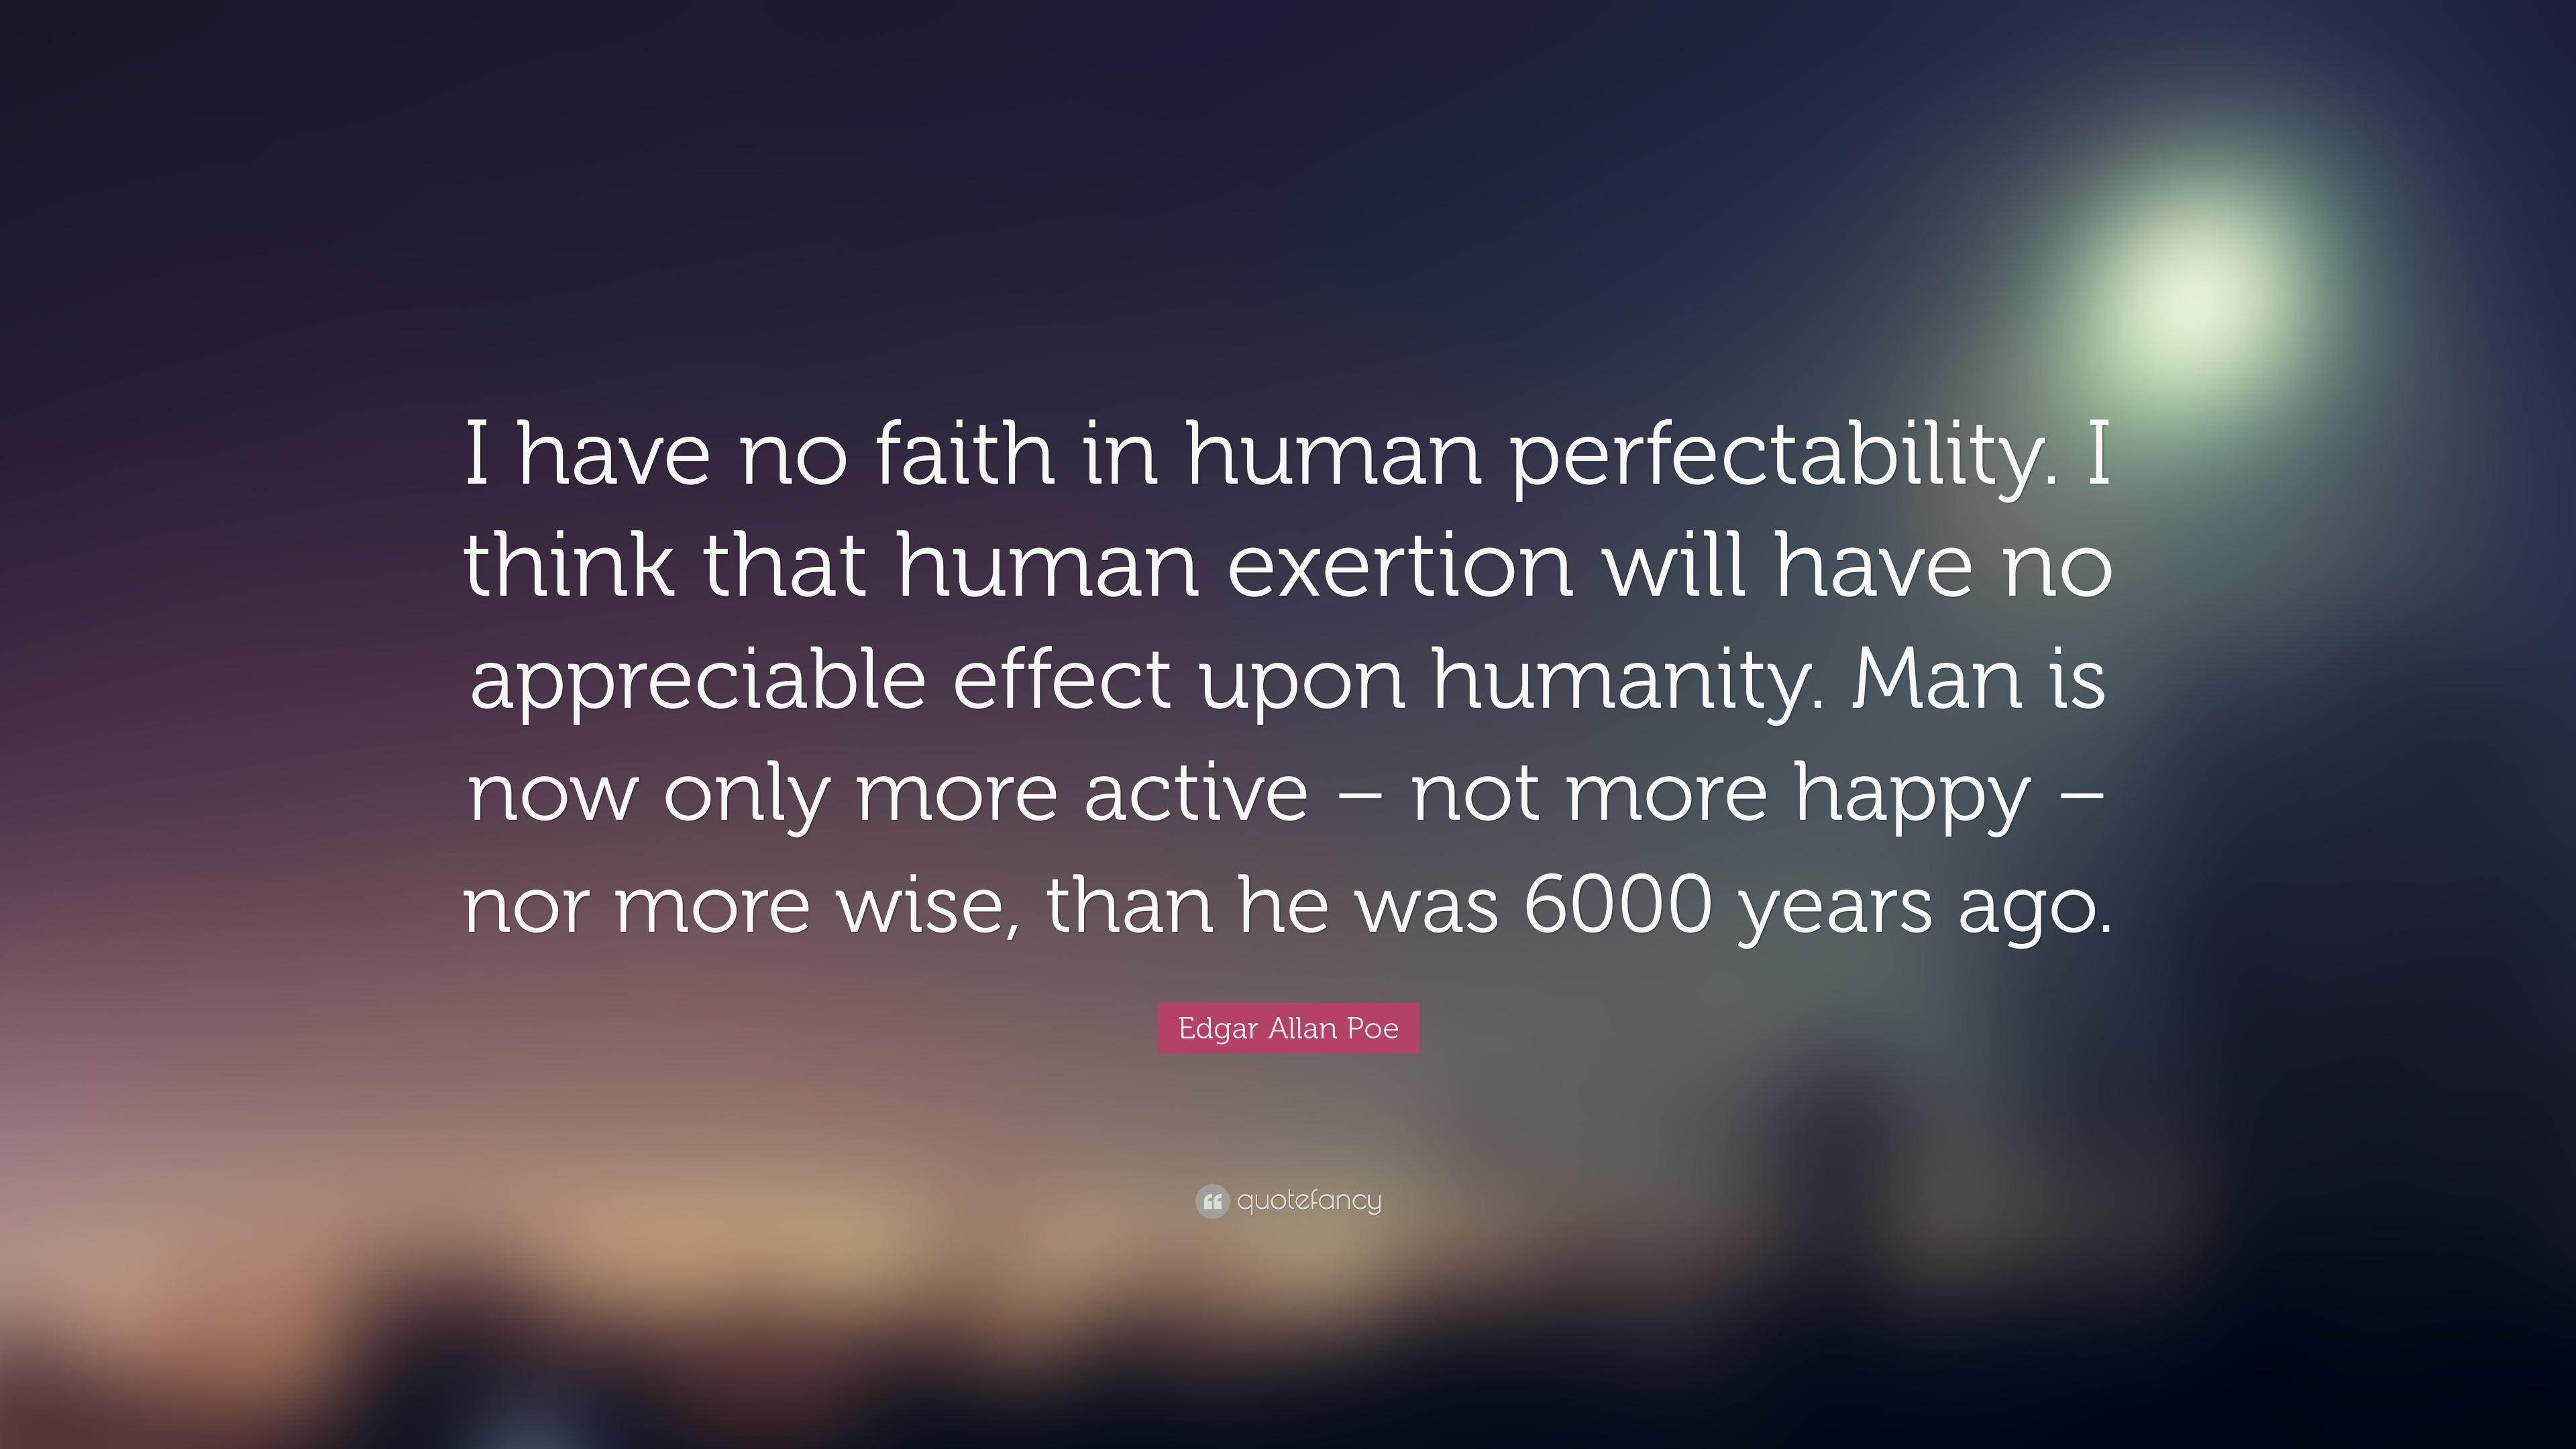 Book Quote Wallpaper Edgar Allan Poe Edgar Allan Poe Quote I Have No Faith In Human